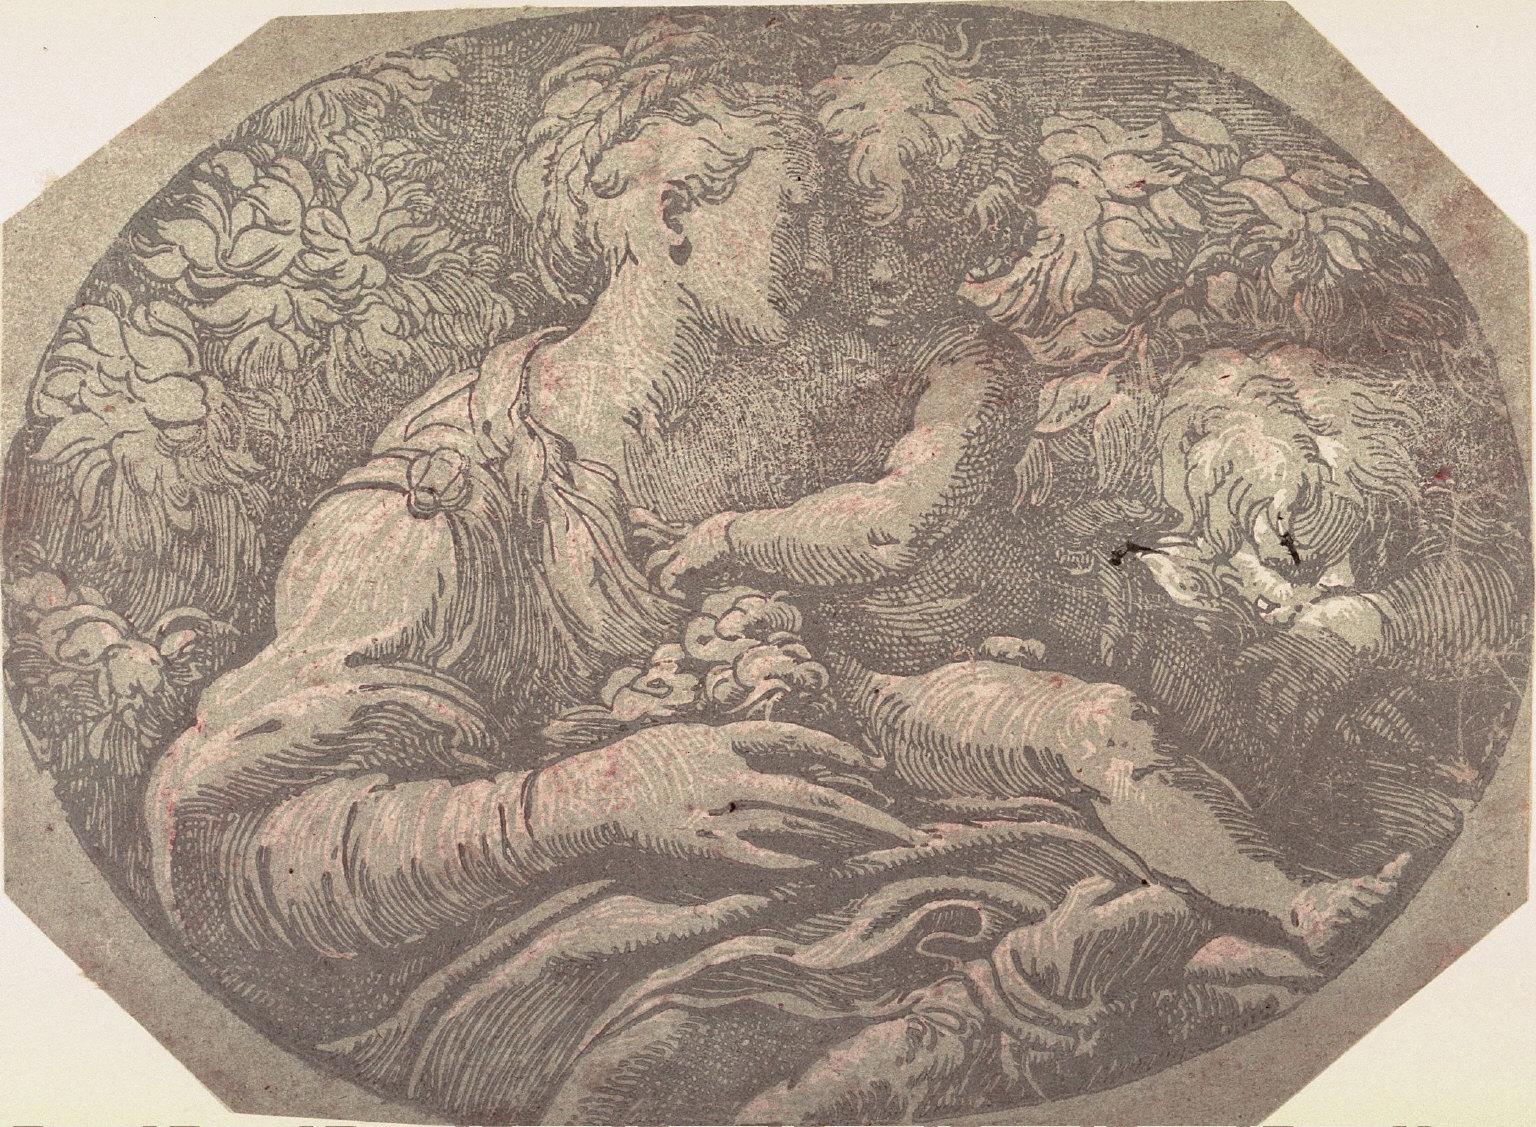 Madonna and Child, after Parmigianino